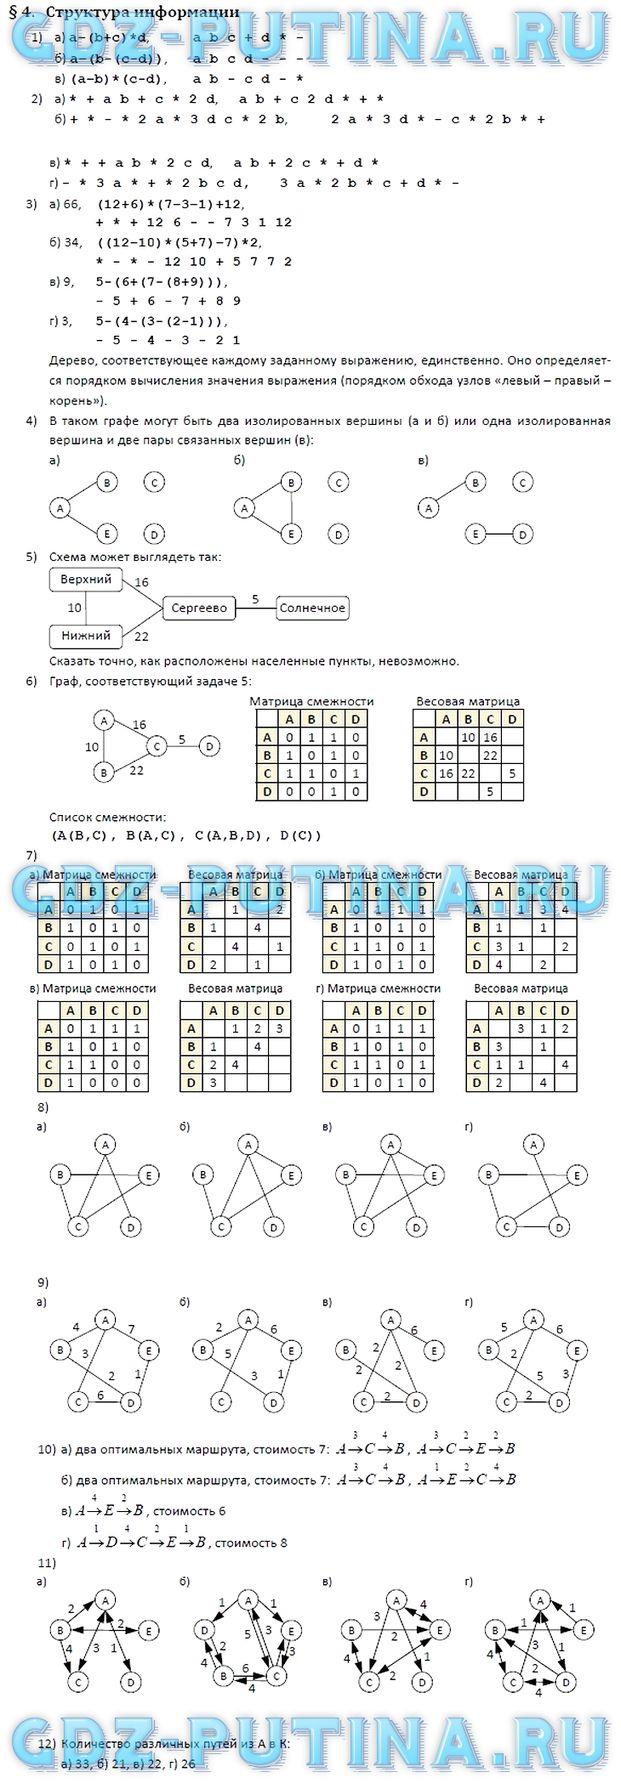 Гдз по информатики 10 класс решение задач физ мат решение задач